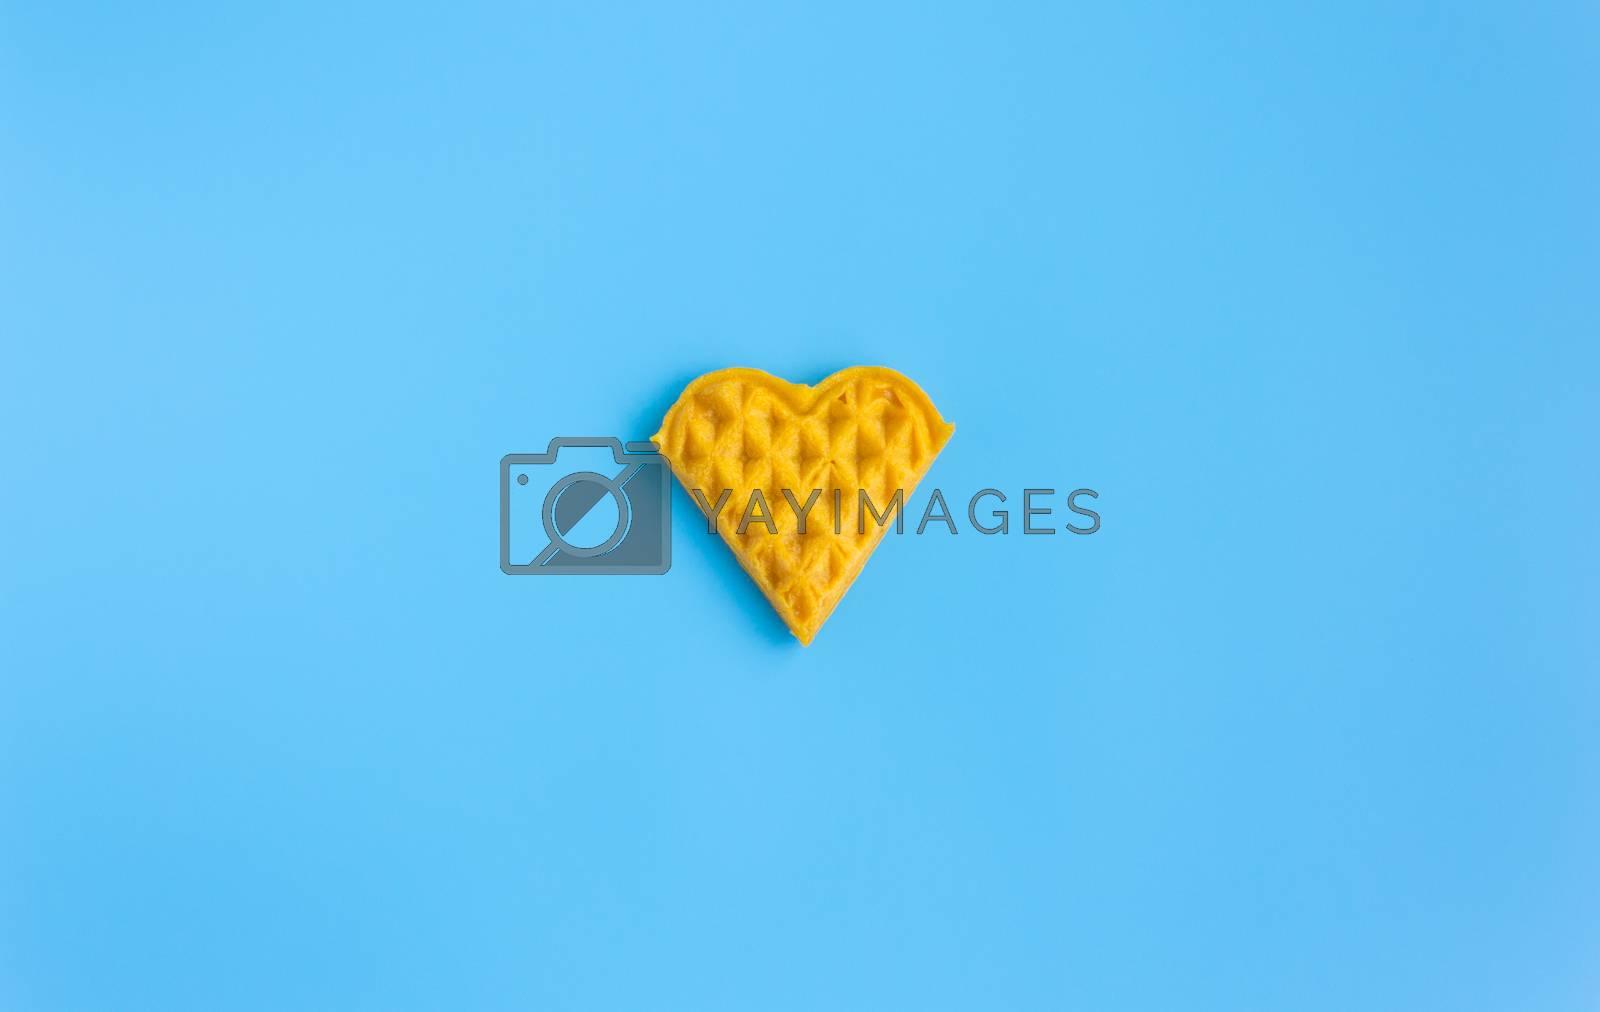 1 Piece Heart Shape Waffle on Blue Pastel Background Minimalist Style Wide Angle. Heart shape waffle dessert in minimalist style for food and dessert category